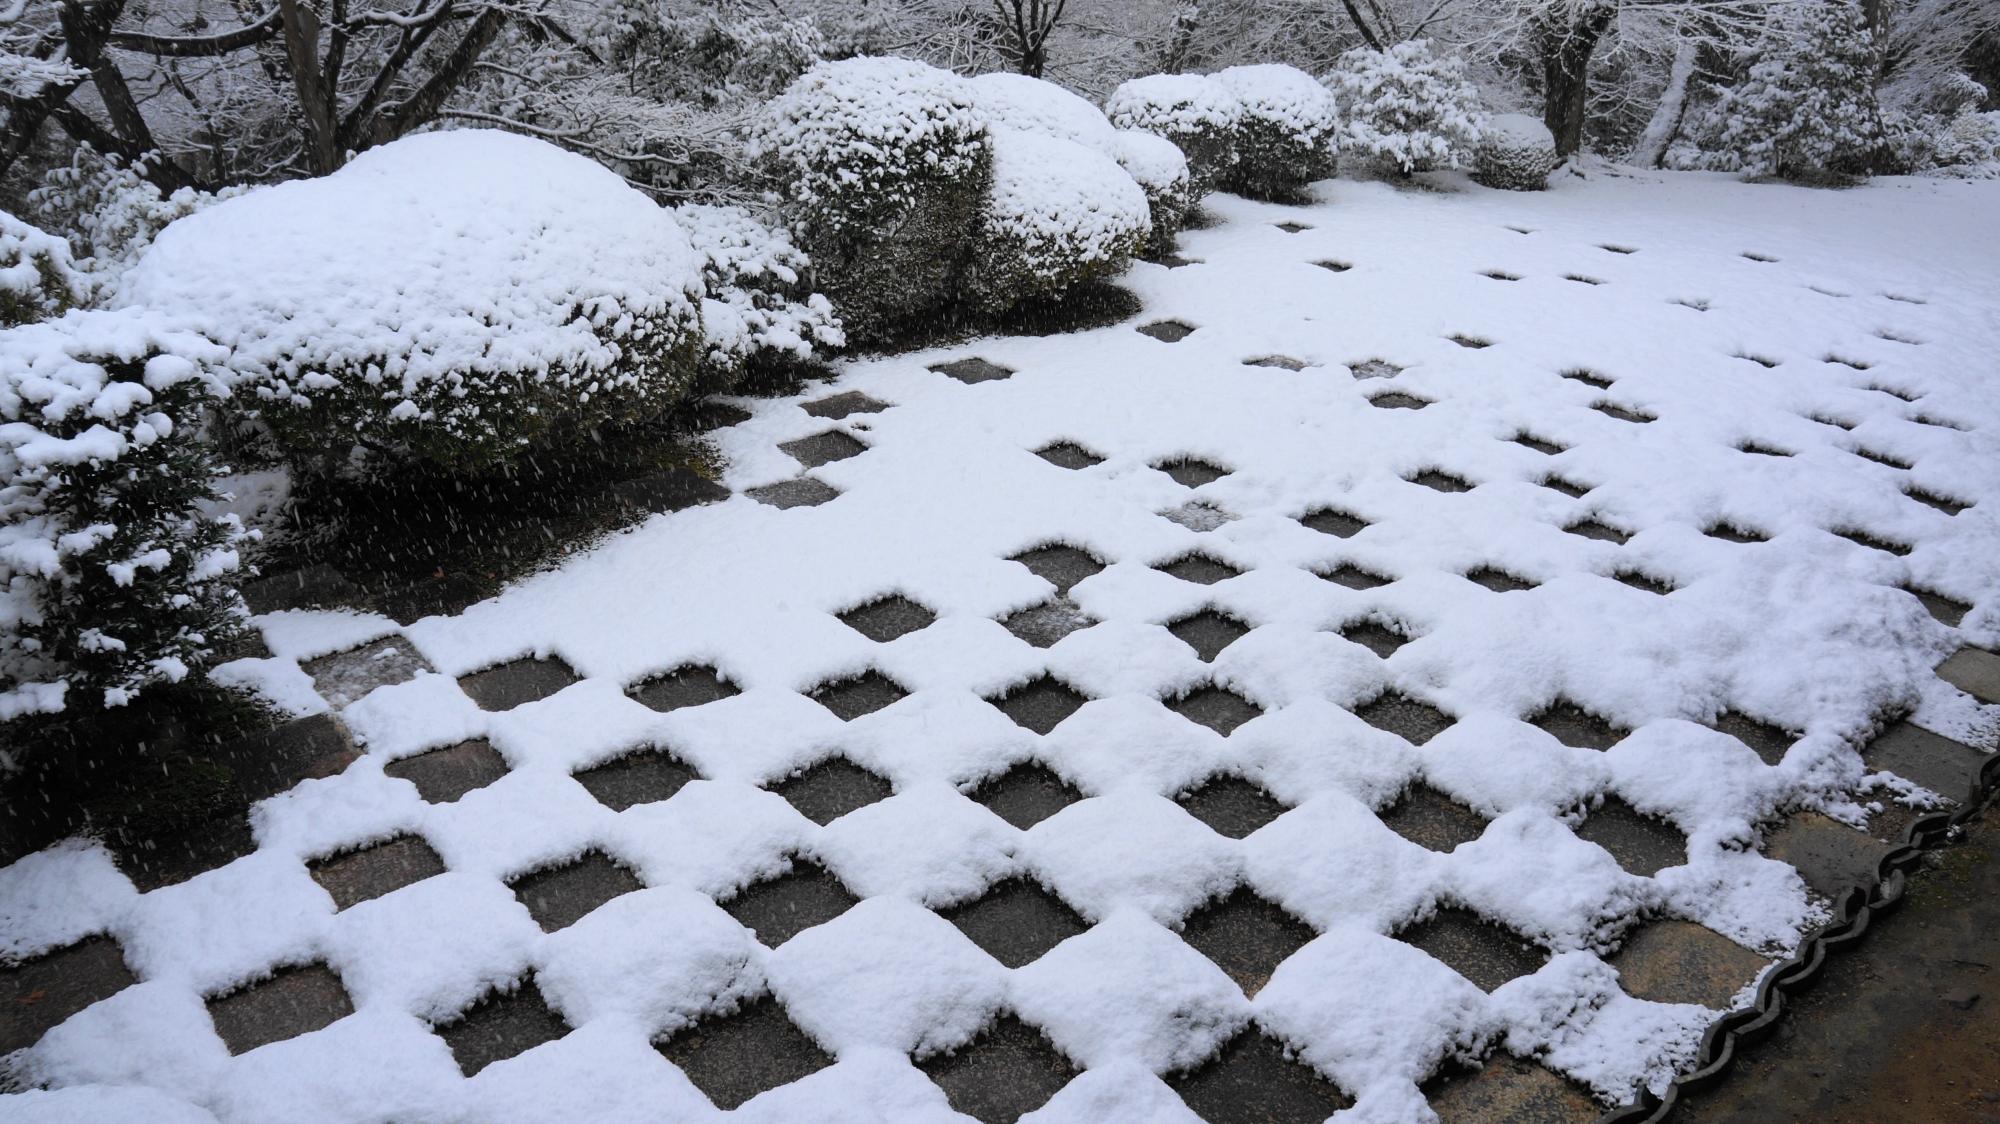 東福寺の方丈北庭(方丈庭園北庭)の雪景色